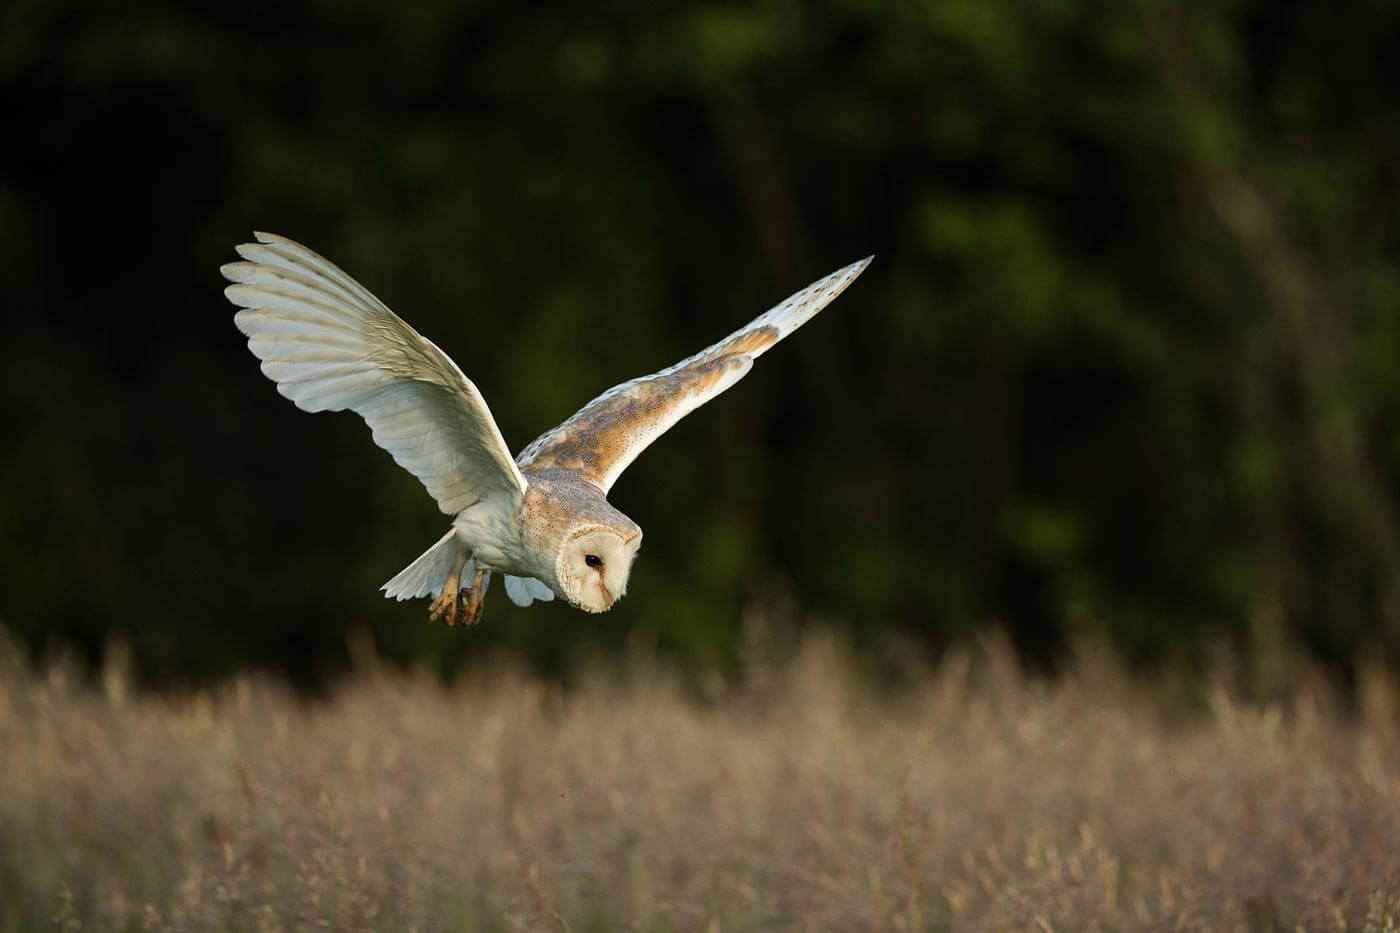 Barn Owl hunting in field